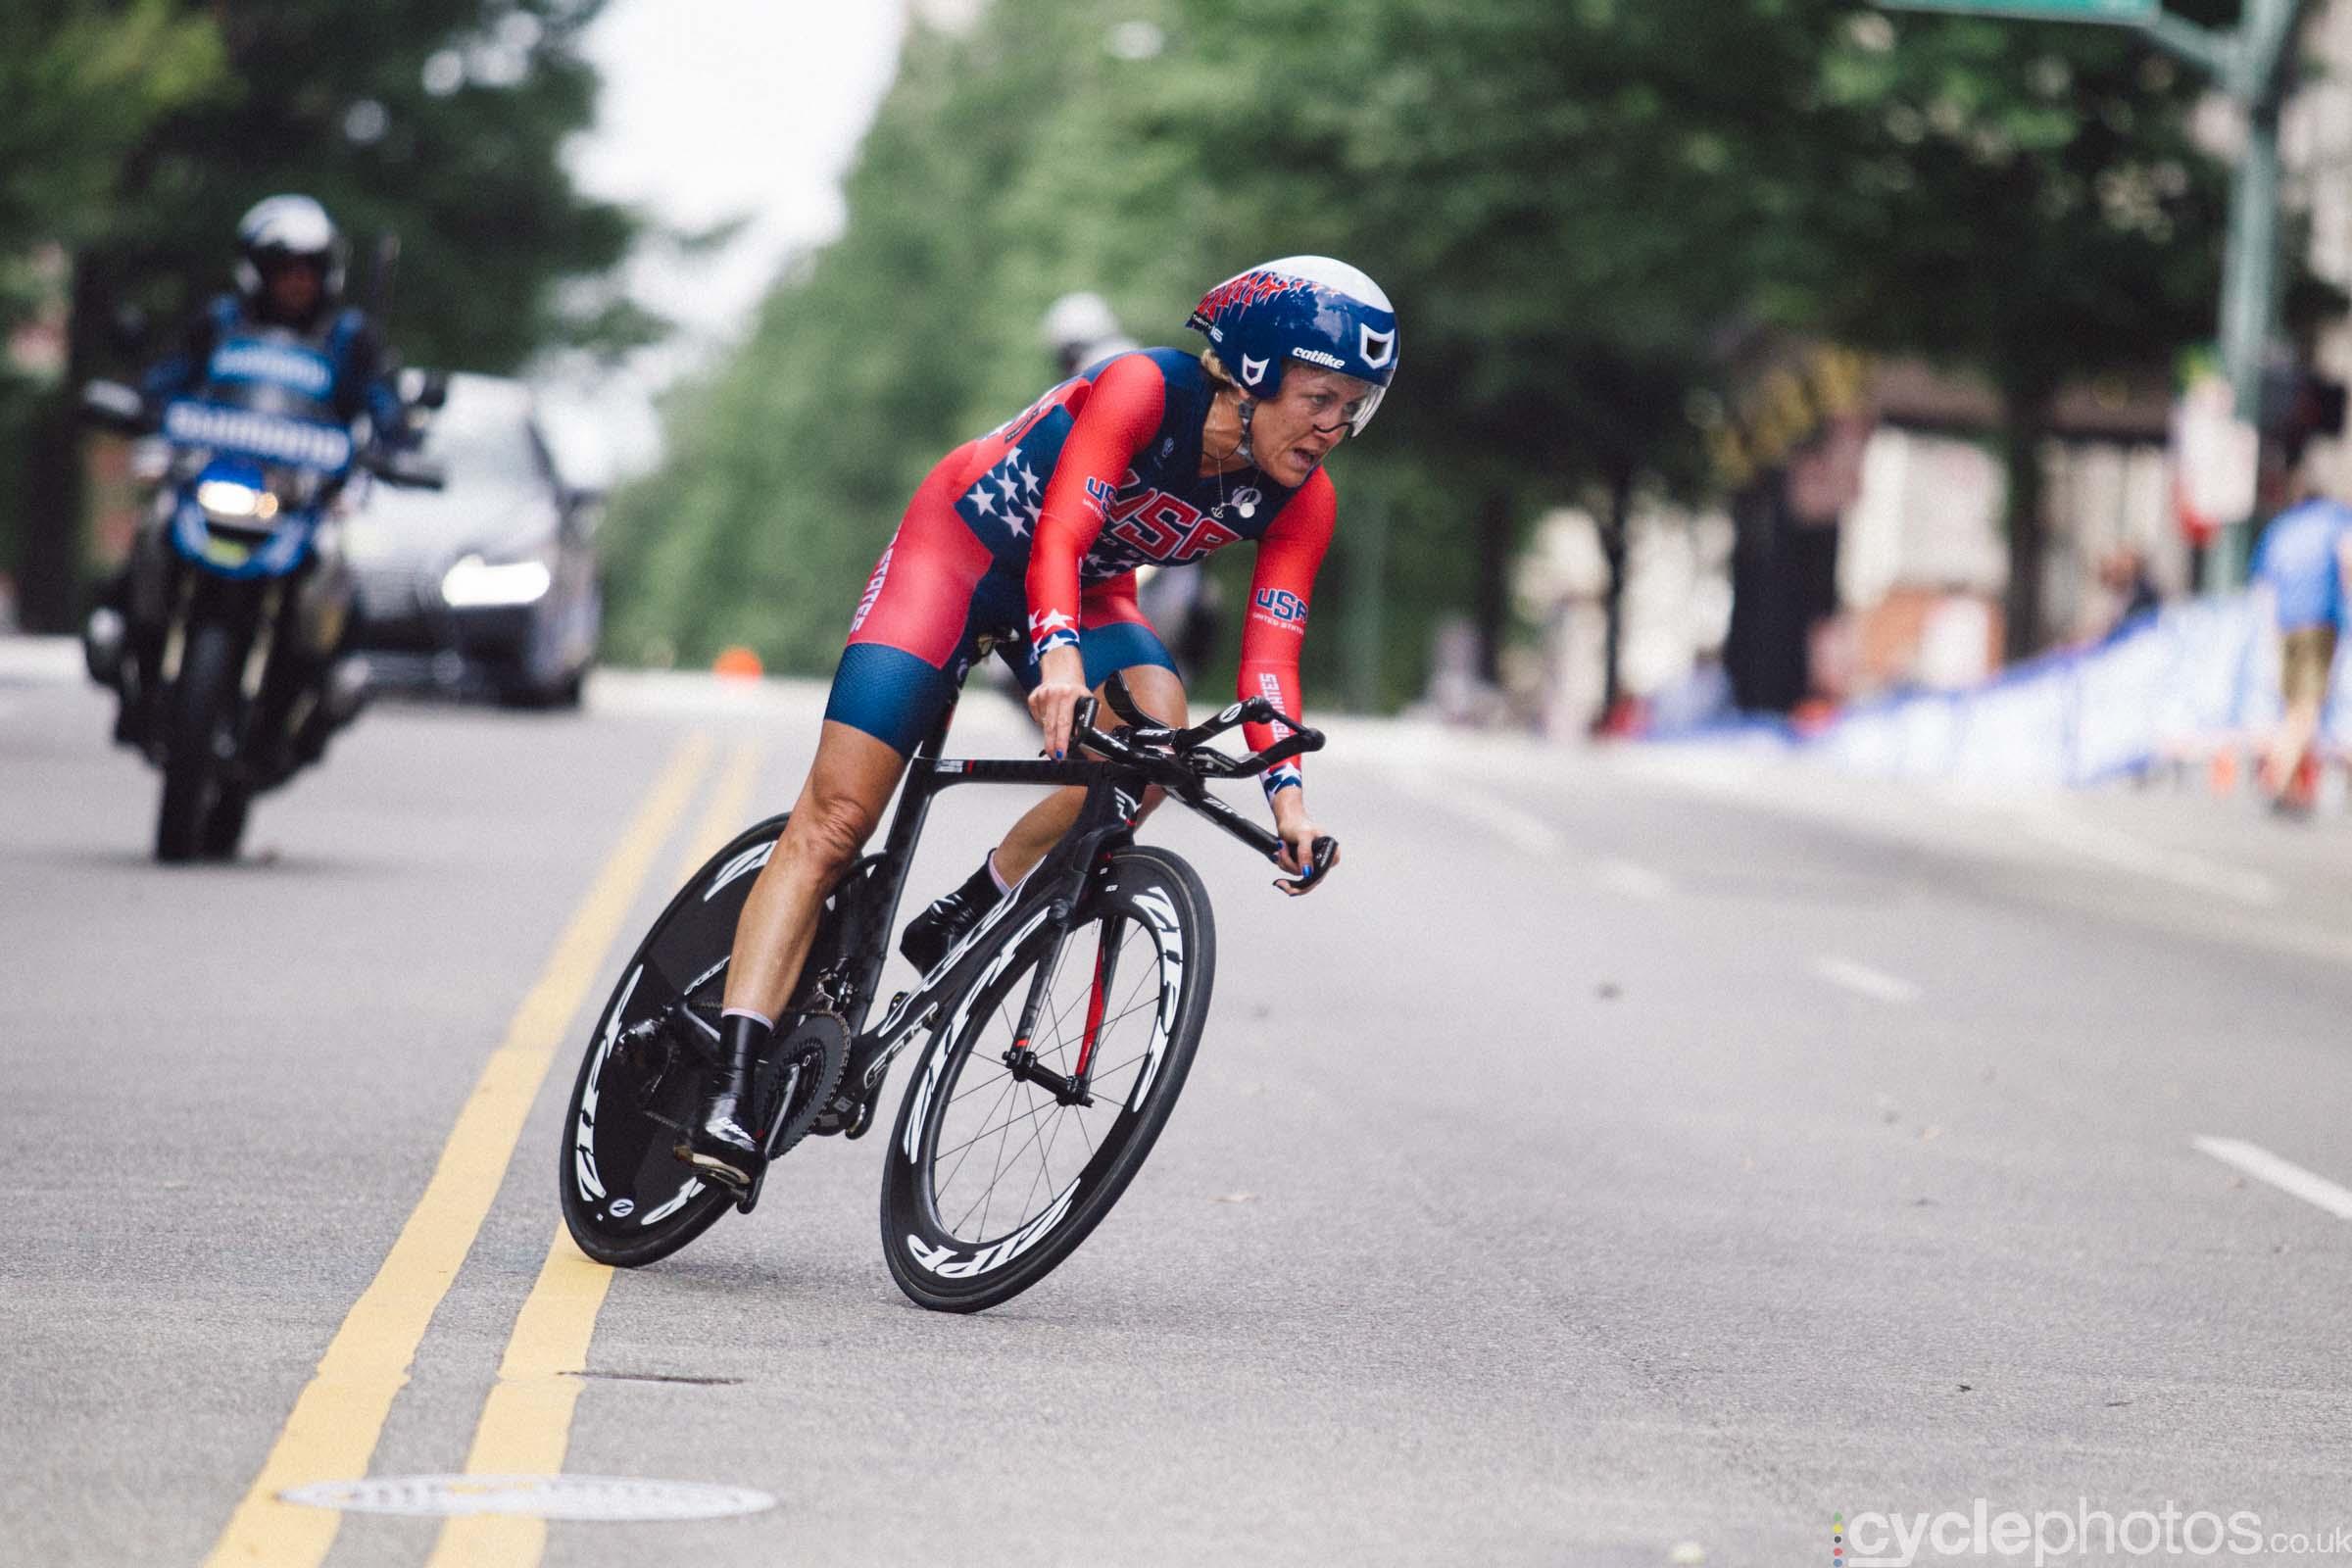 cyclephotos-world-champs-richmond-141019